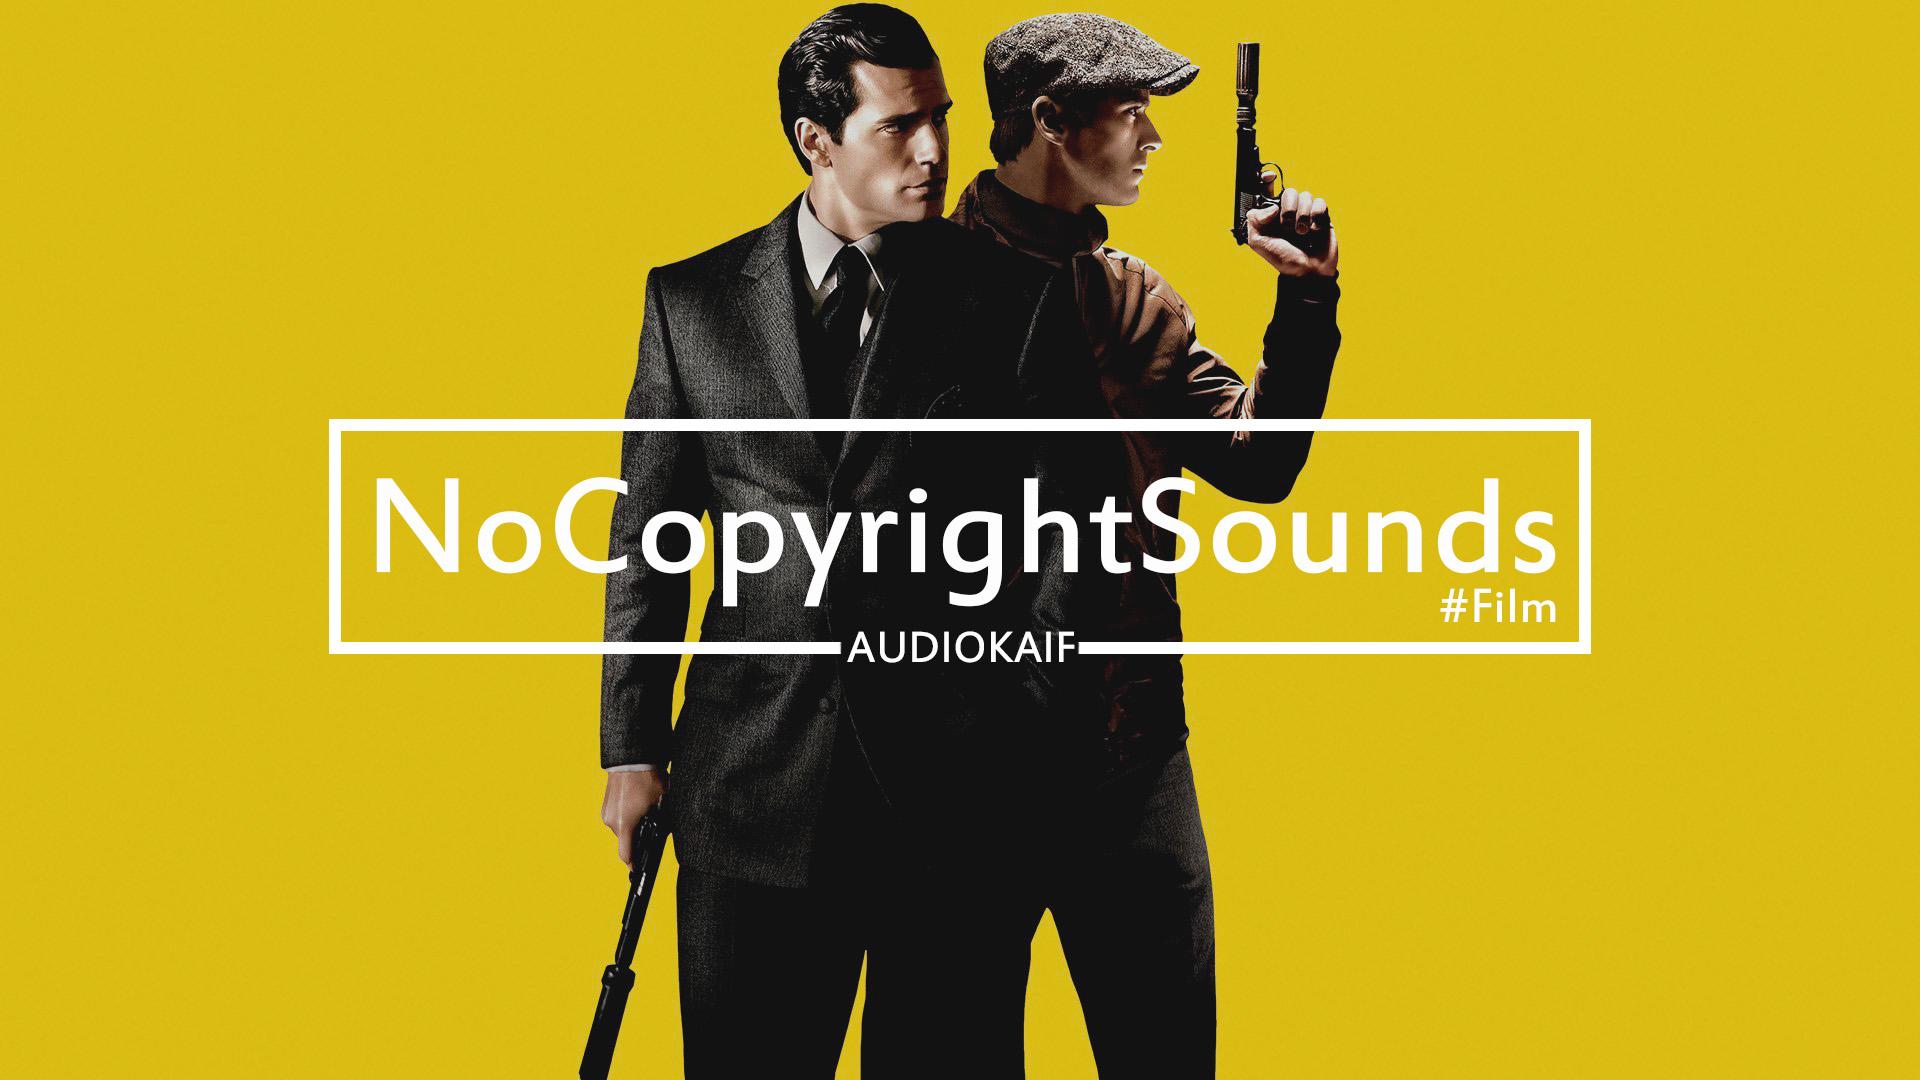 Музыка без авторского права The Proving Grounds Film музыка ютуб видео